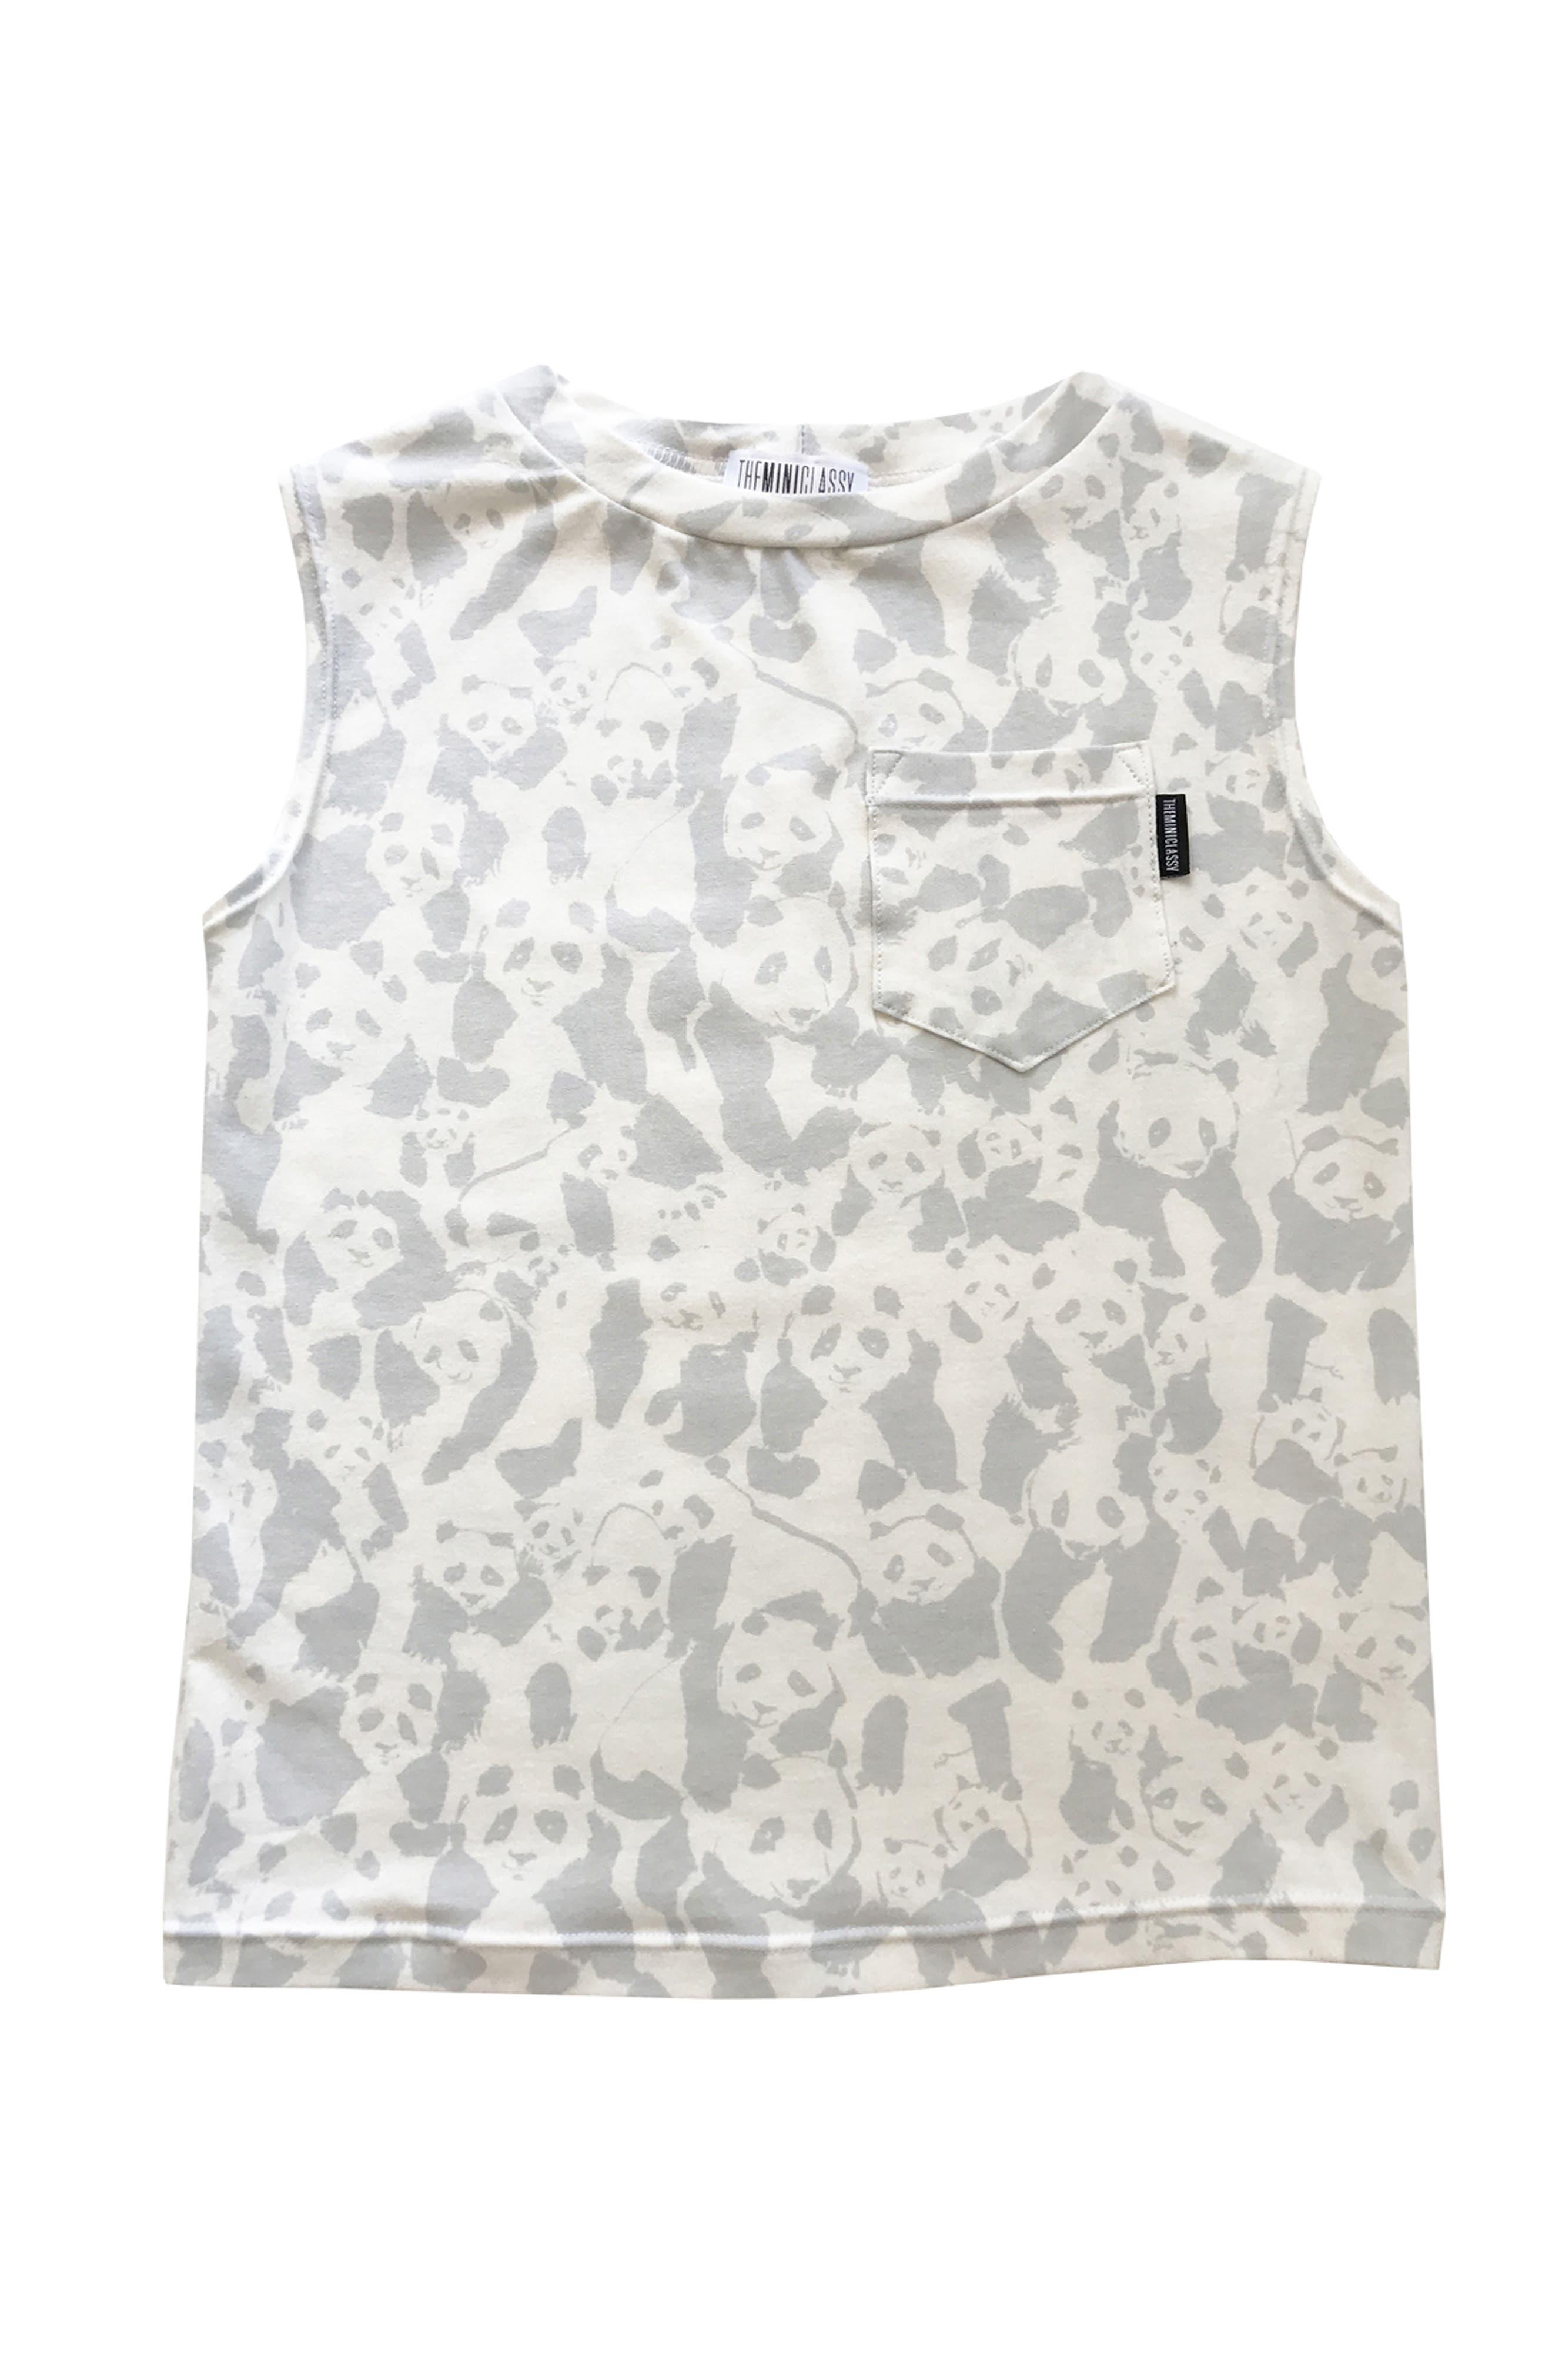 Panda Panda Muscle Tank,                         Main,                         color, Grey/ White